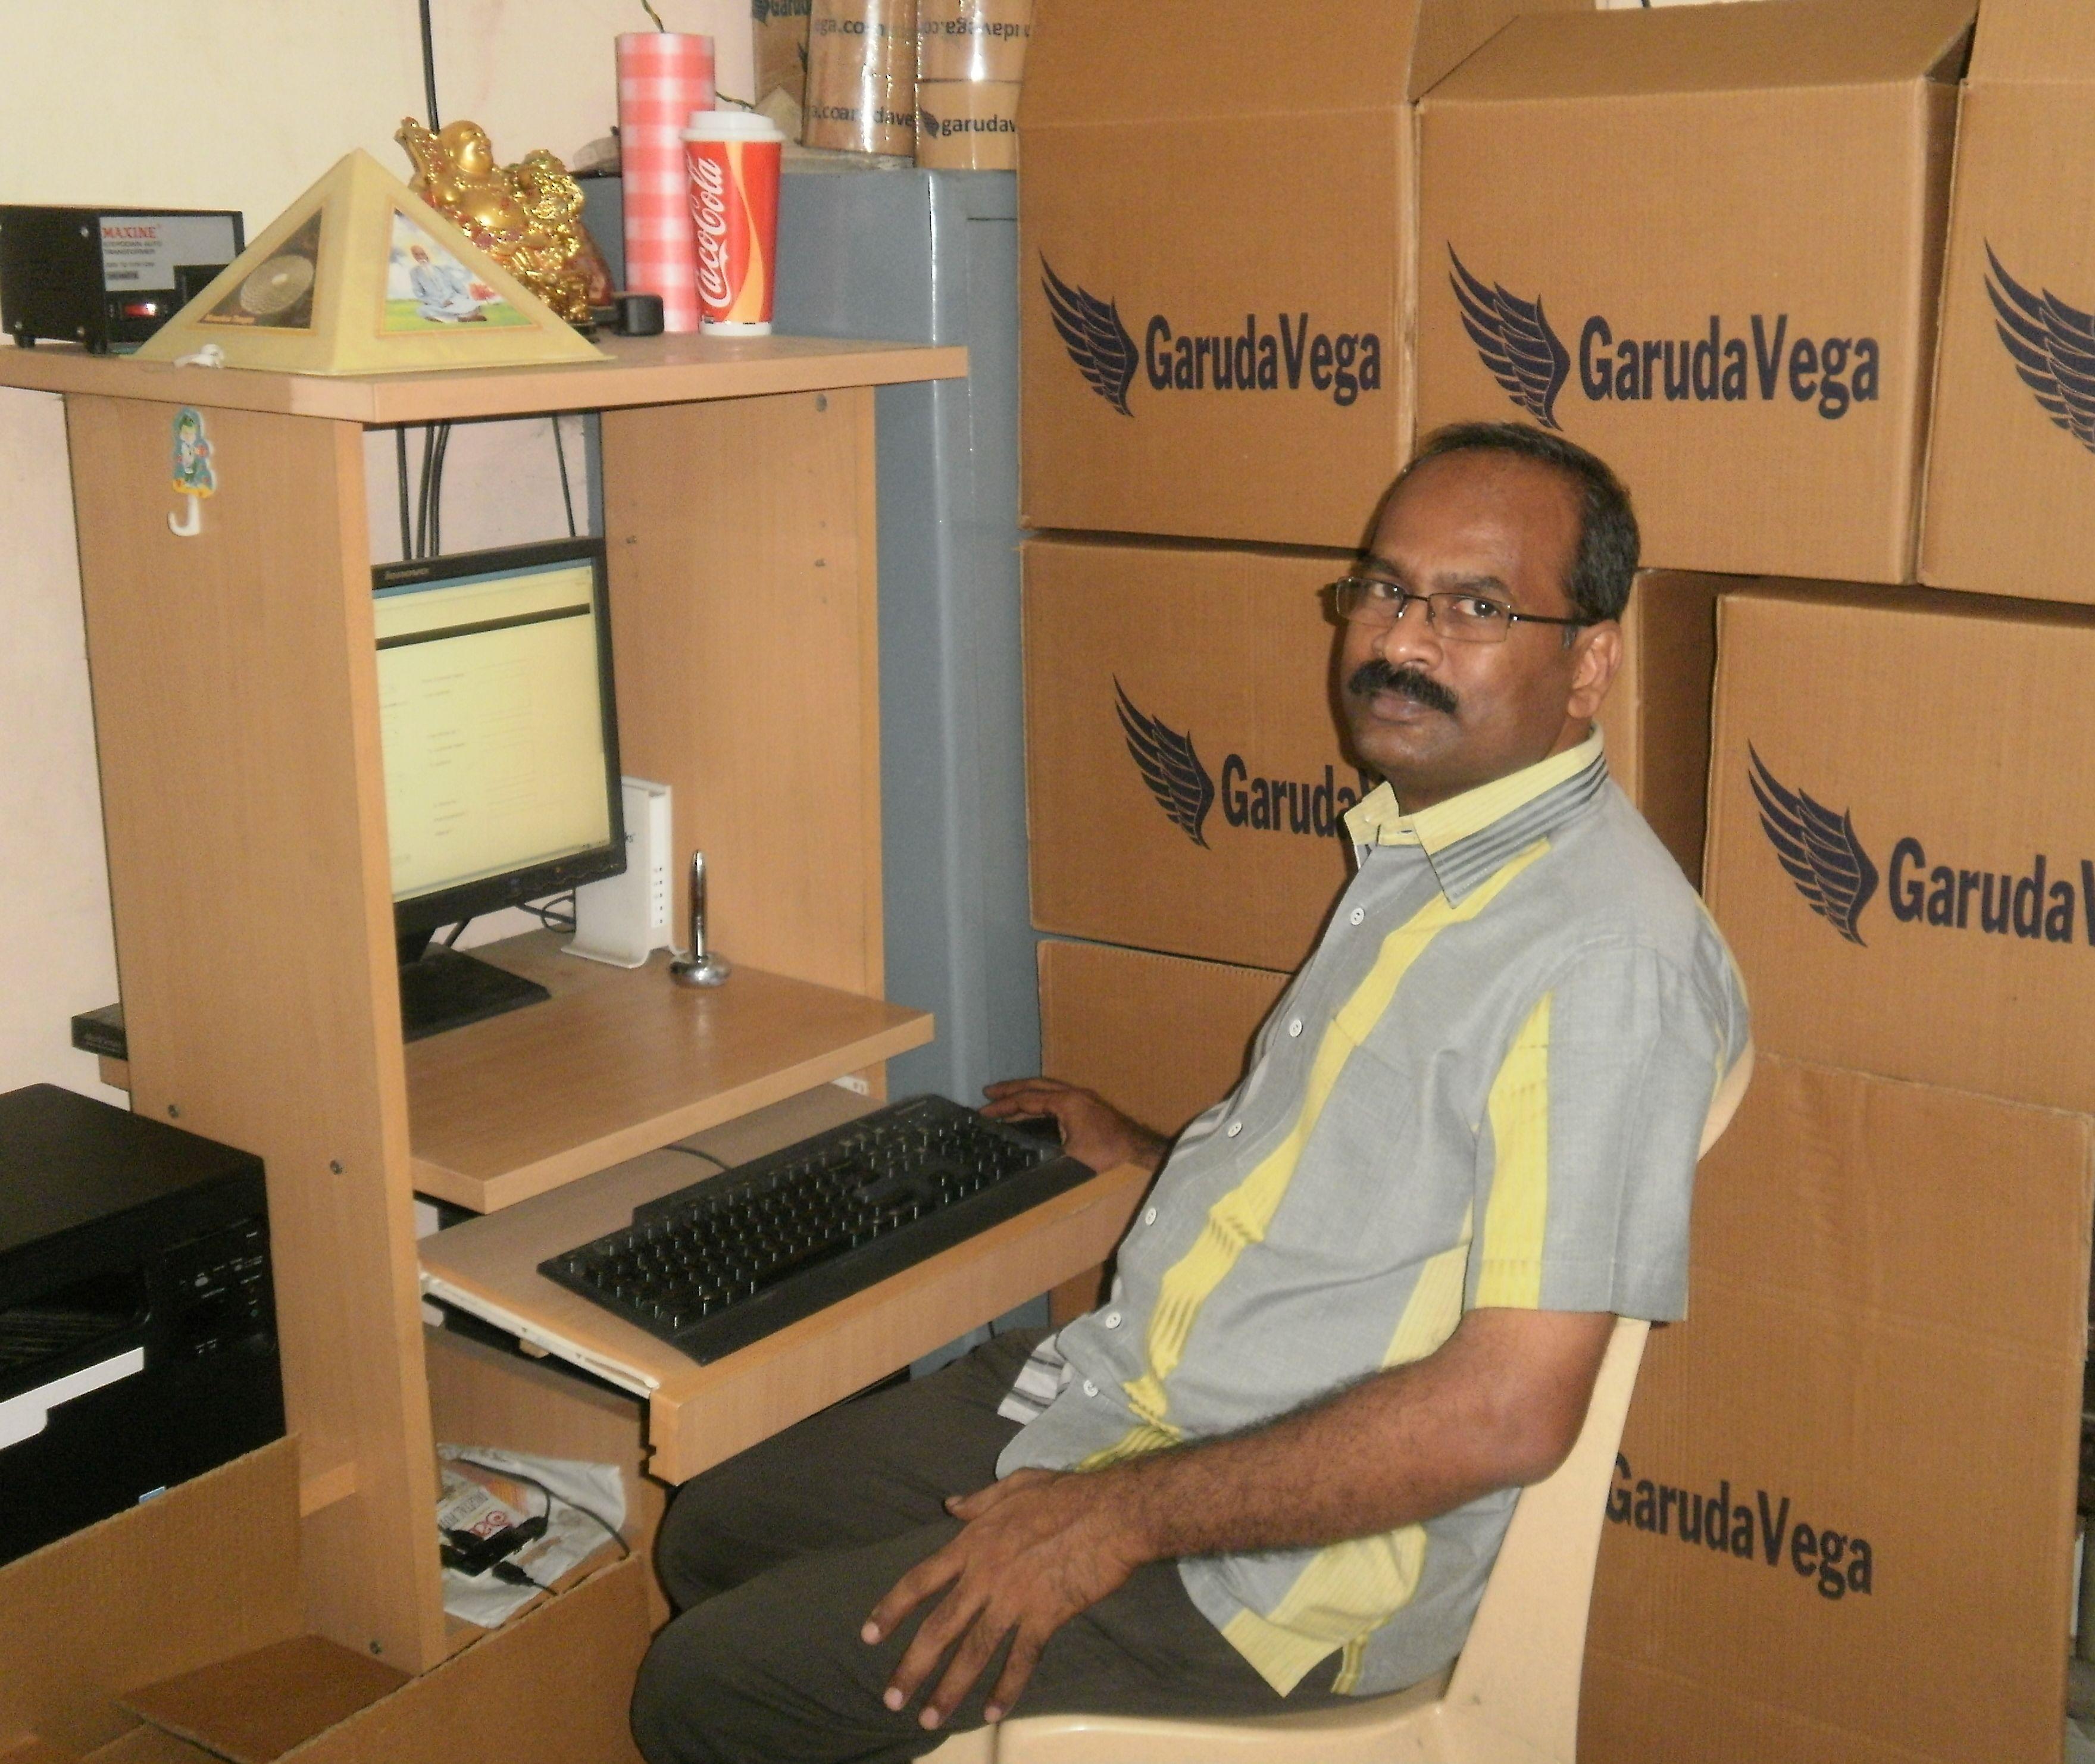 Pappula Street - Garudavega Courier Services - Worldwide